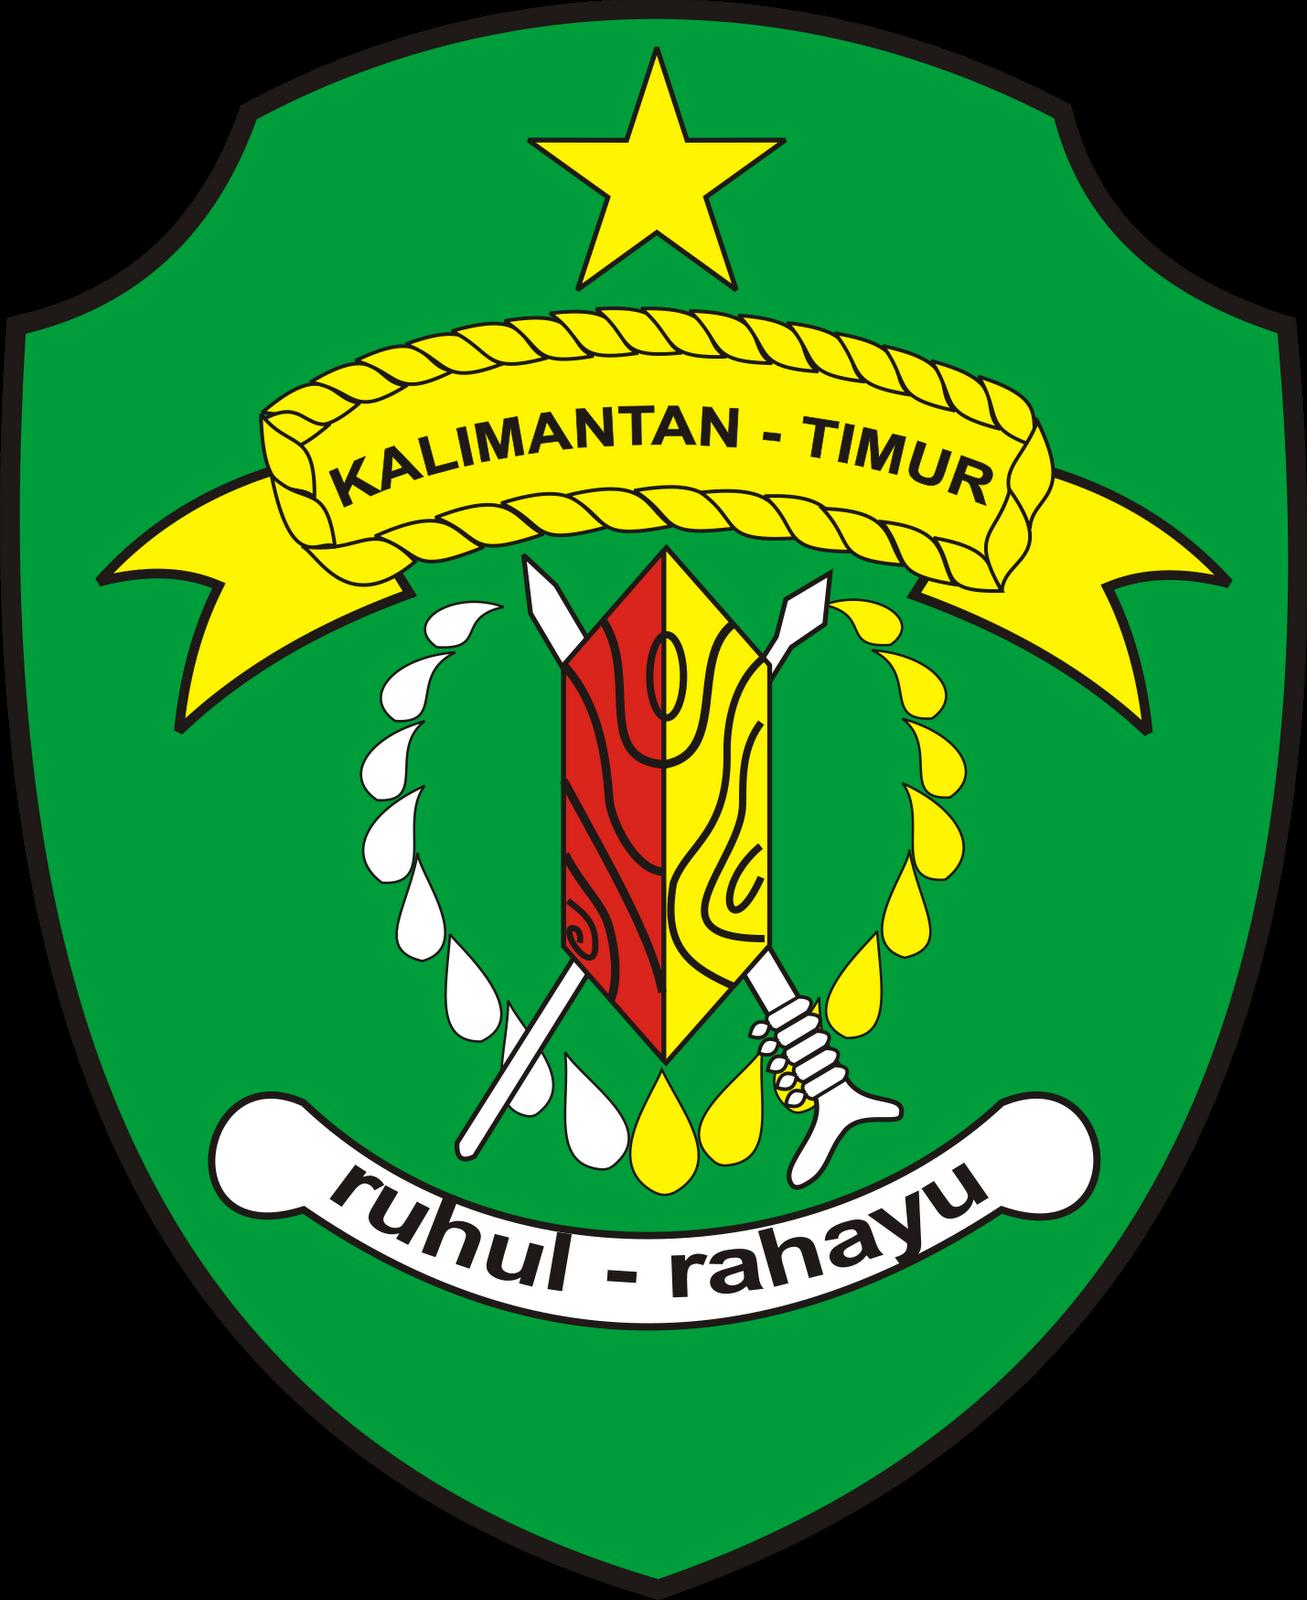 Kalimantan Timur Kota Kalimantan Wallpaper Ponsel